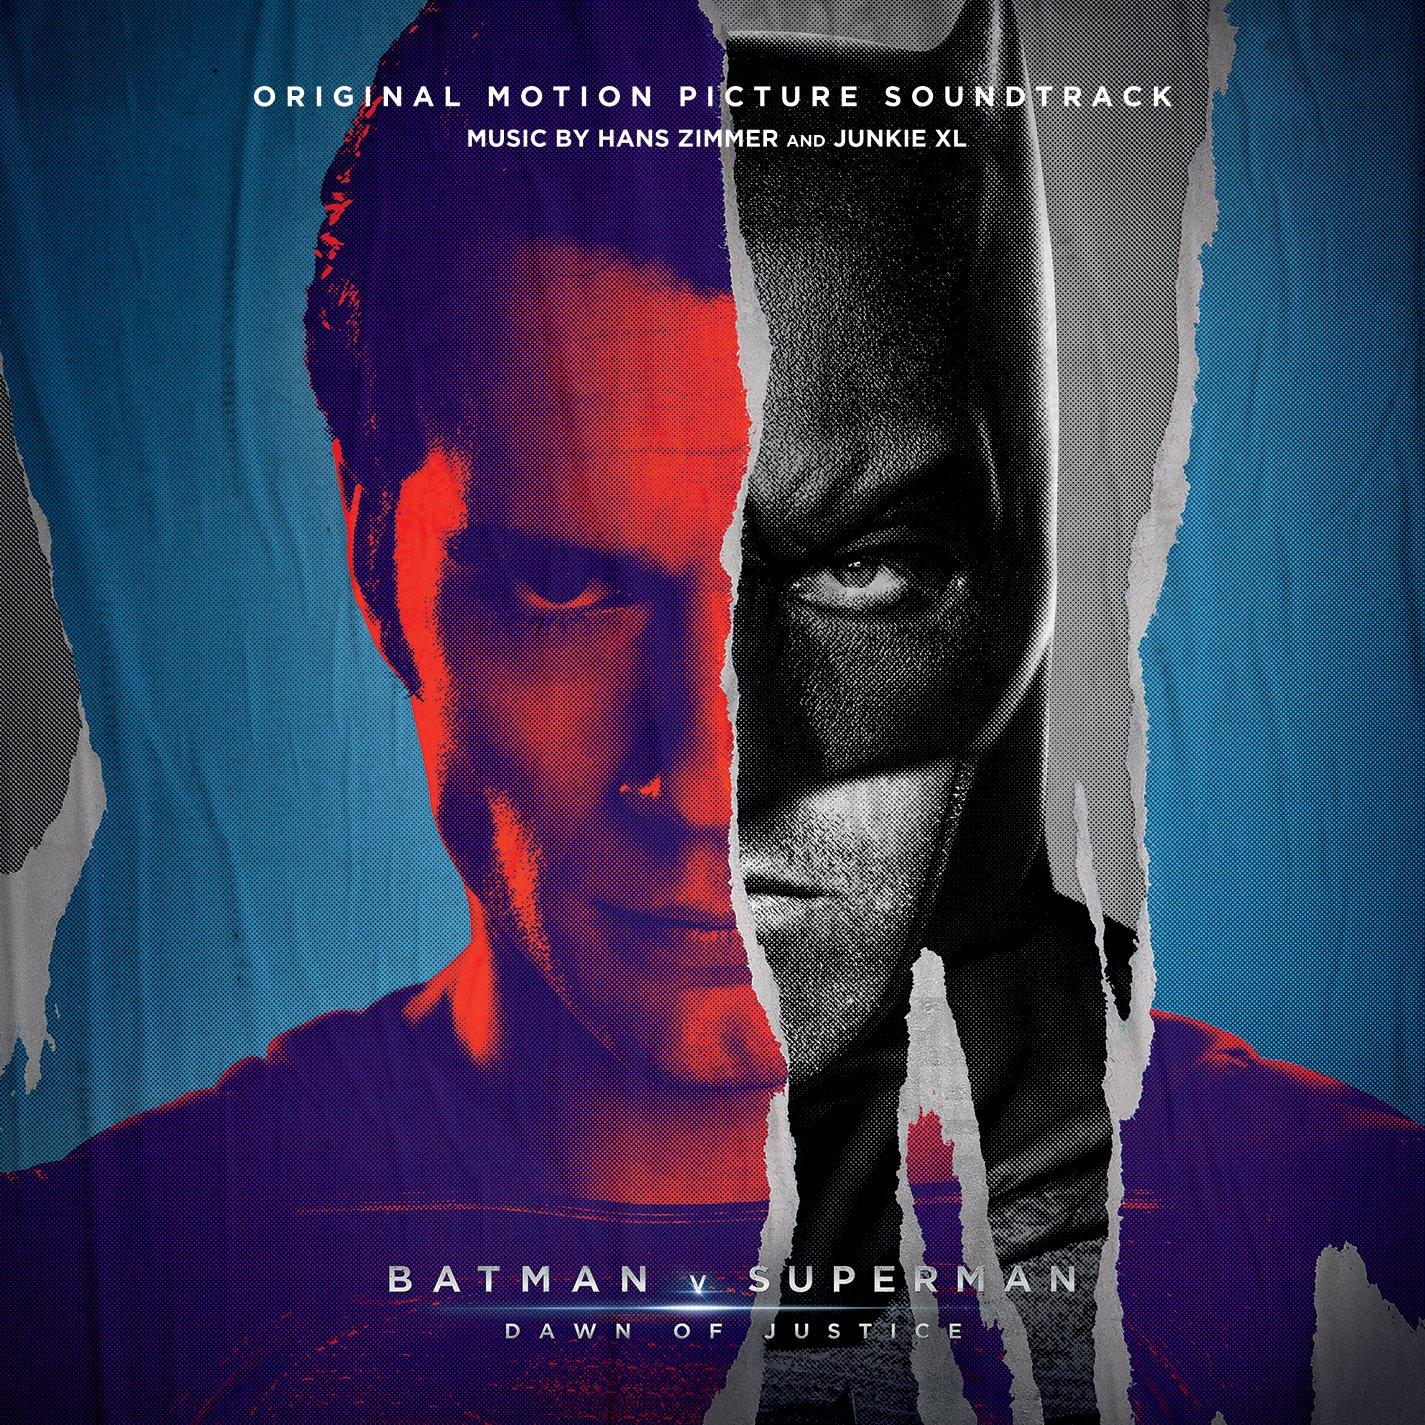 Batman v Superman: Dawn of Justice Soundtrack, Deluxe Edition